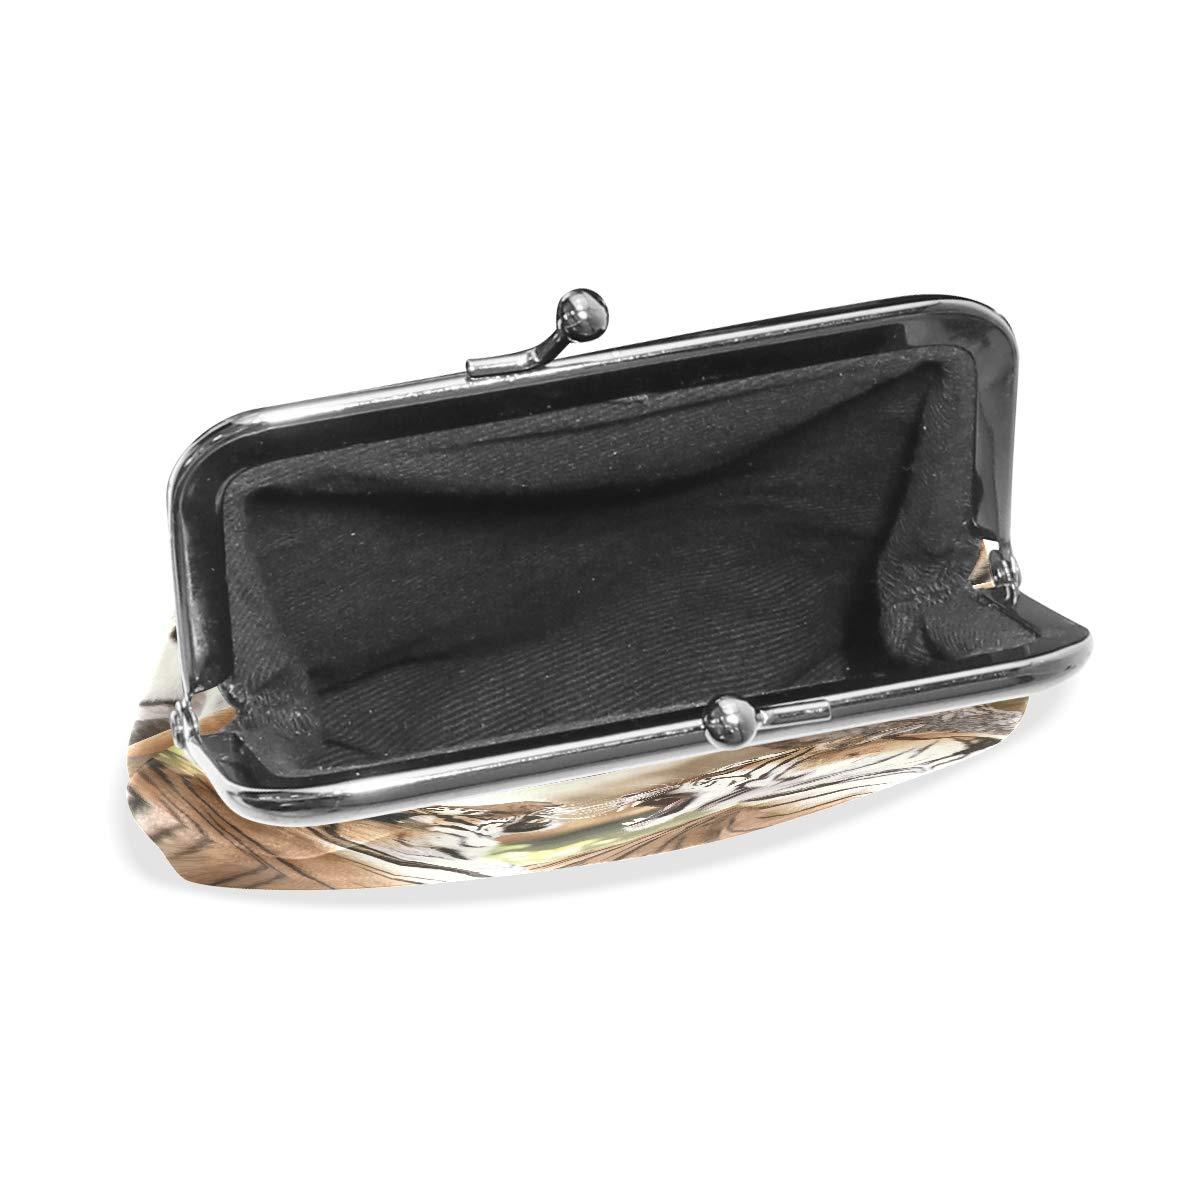 LALATOP Roaring Bengal Tigers Womens Coin Pouch Purse wallet Card Holder Clutch Handbag